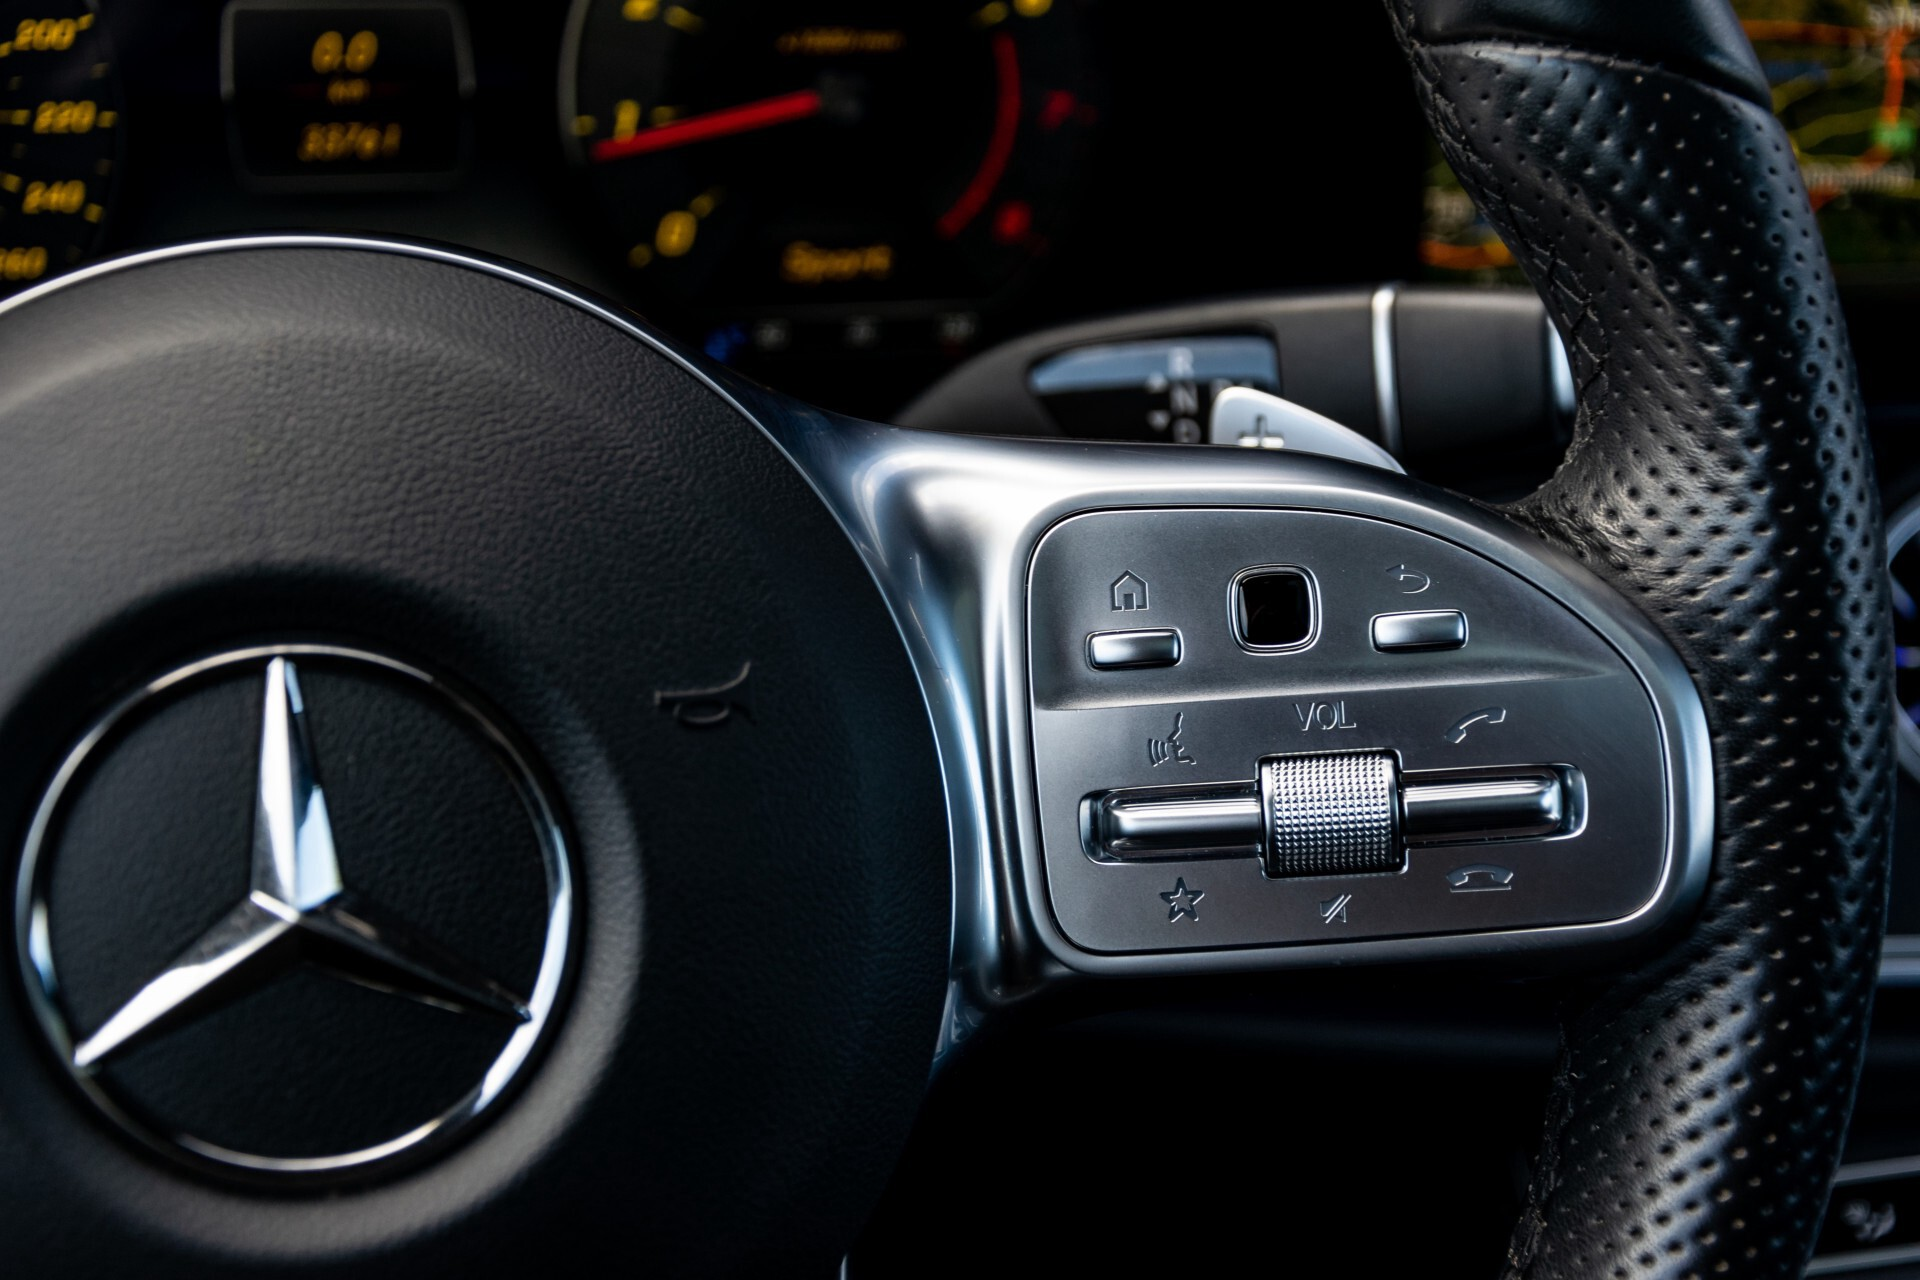 Mercedes-Benz E-Klasse Coupé 300 AMG Panorama/Rij-assist/Keyless/Massage/Memory/HUD/Standkachel/Night Aut9 Foto 16